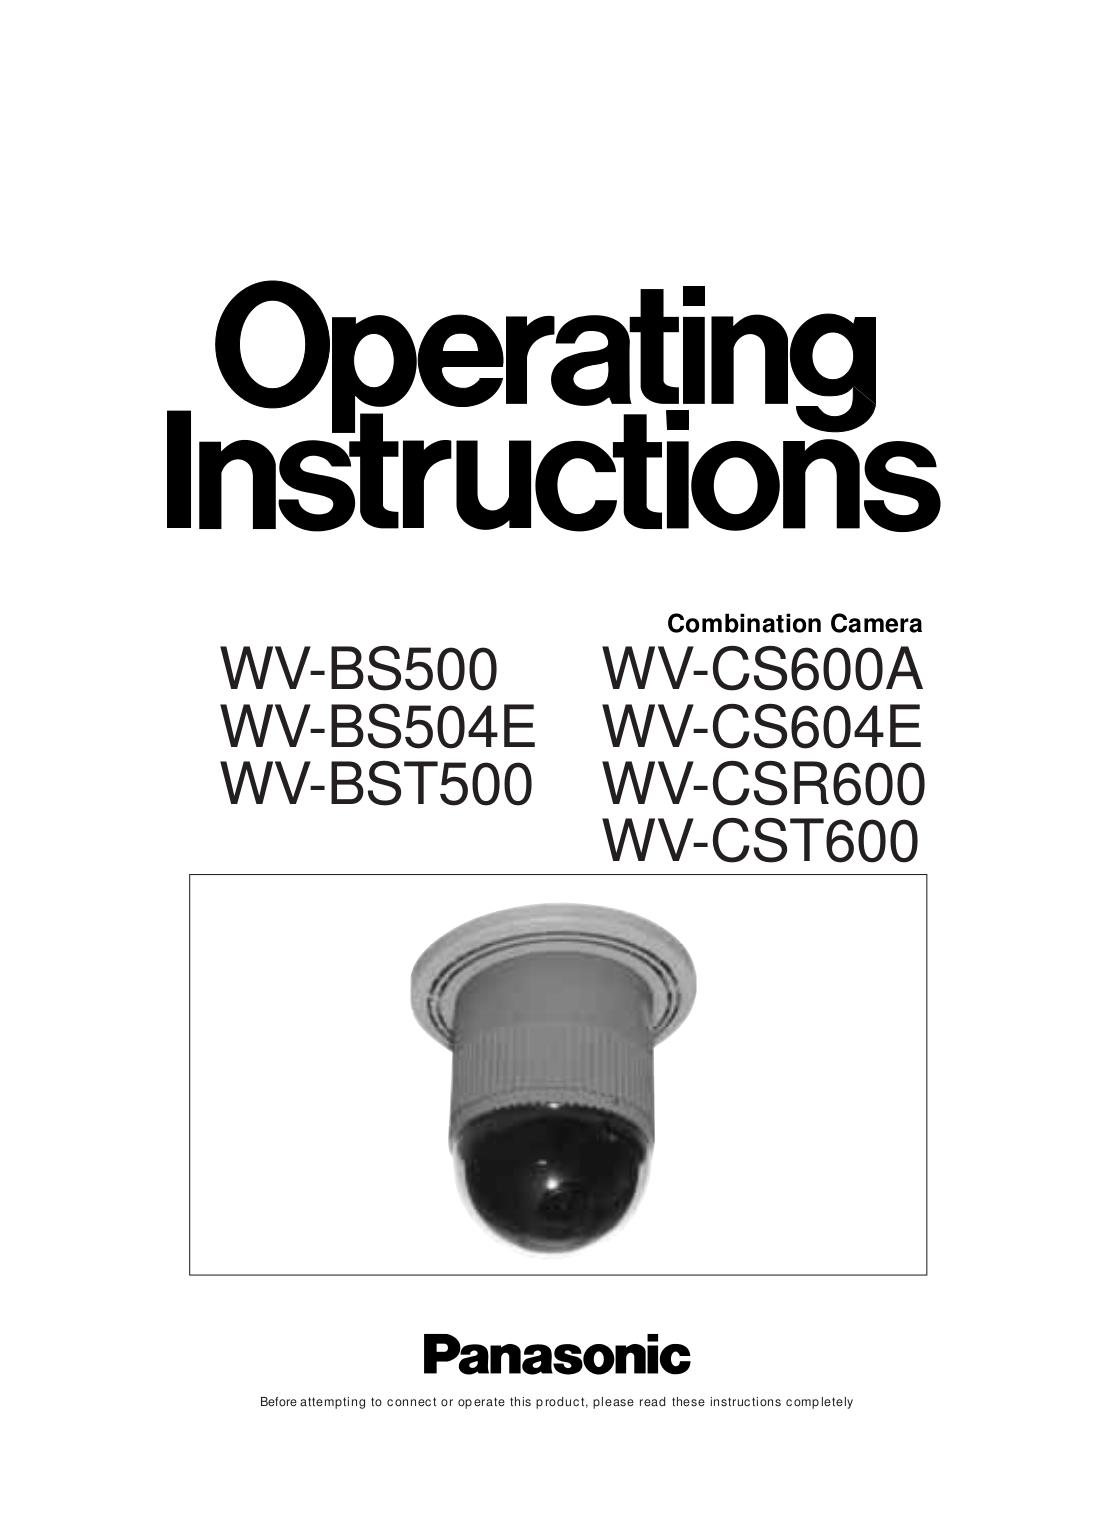 panasonic lumix user manual pdf